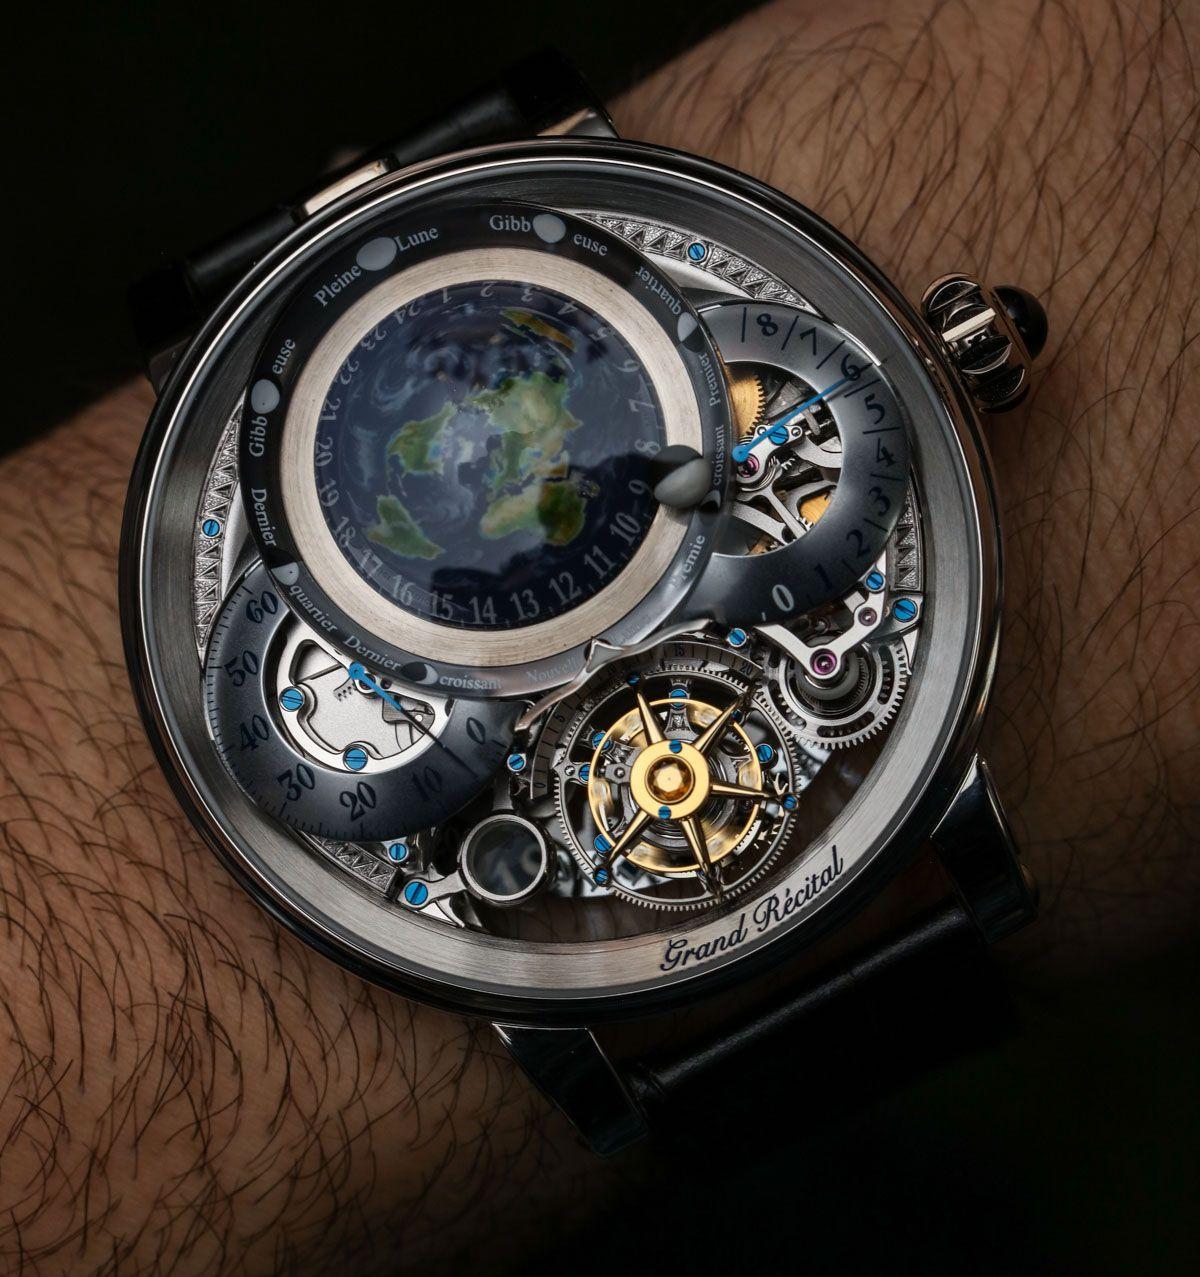 5abe68b63d4 Bovet Récital 22 Grand Récital Watch Hands-On  bovet  bovetrecital  watches  Relógios